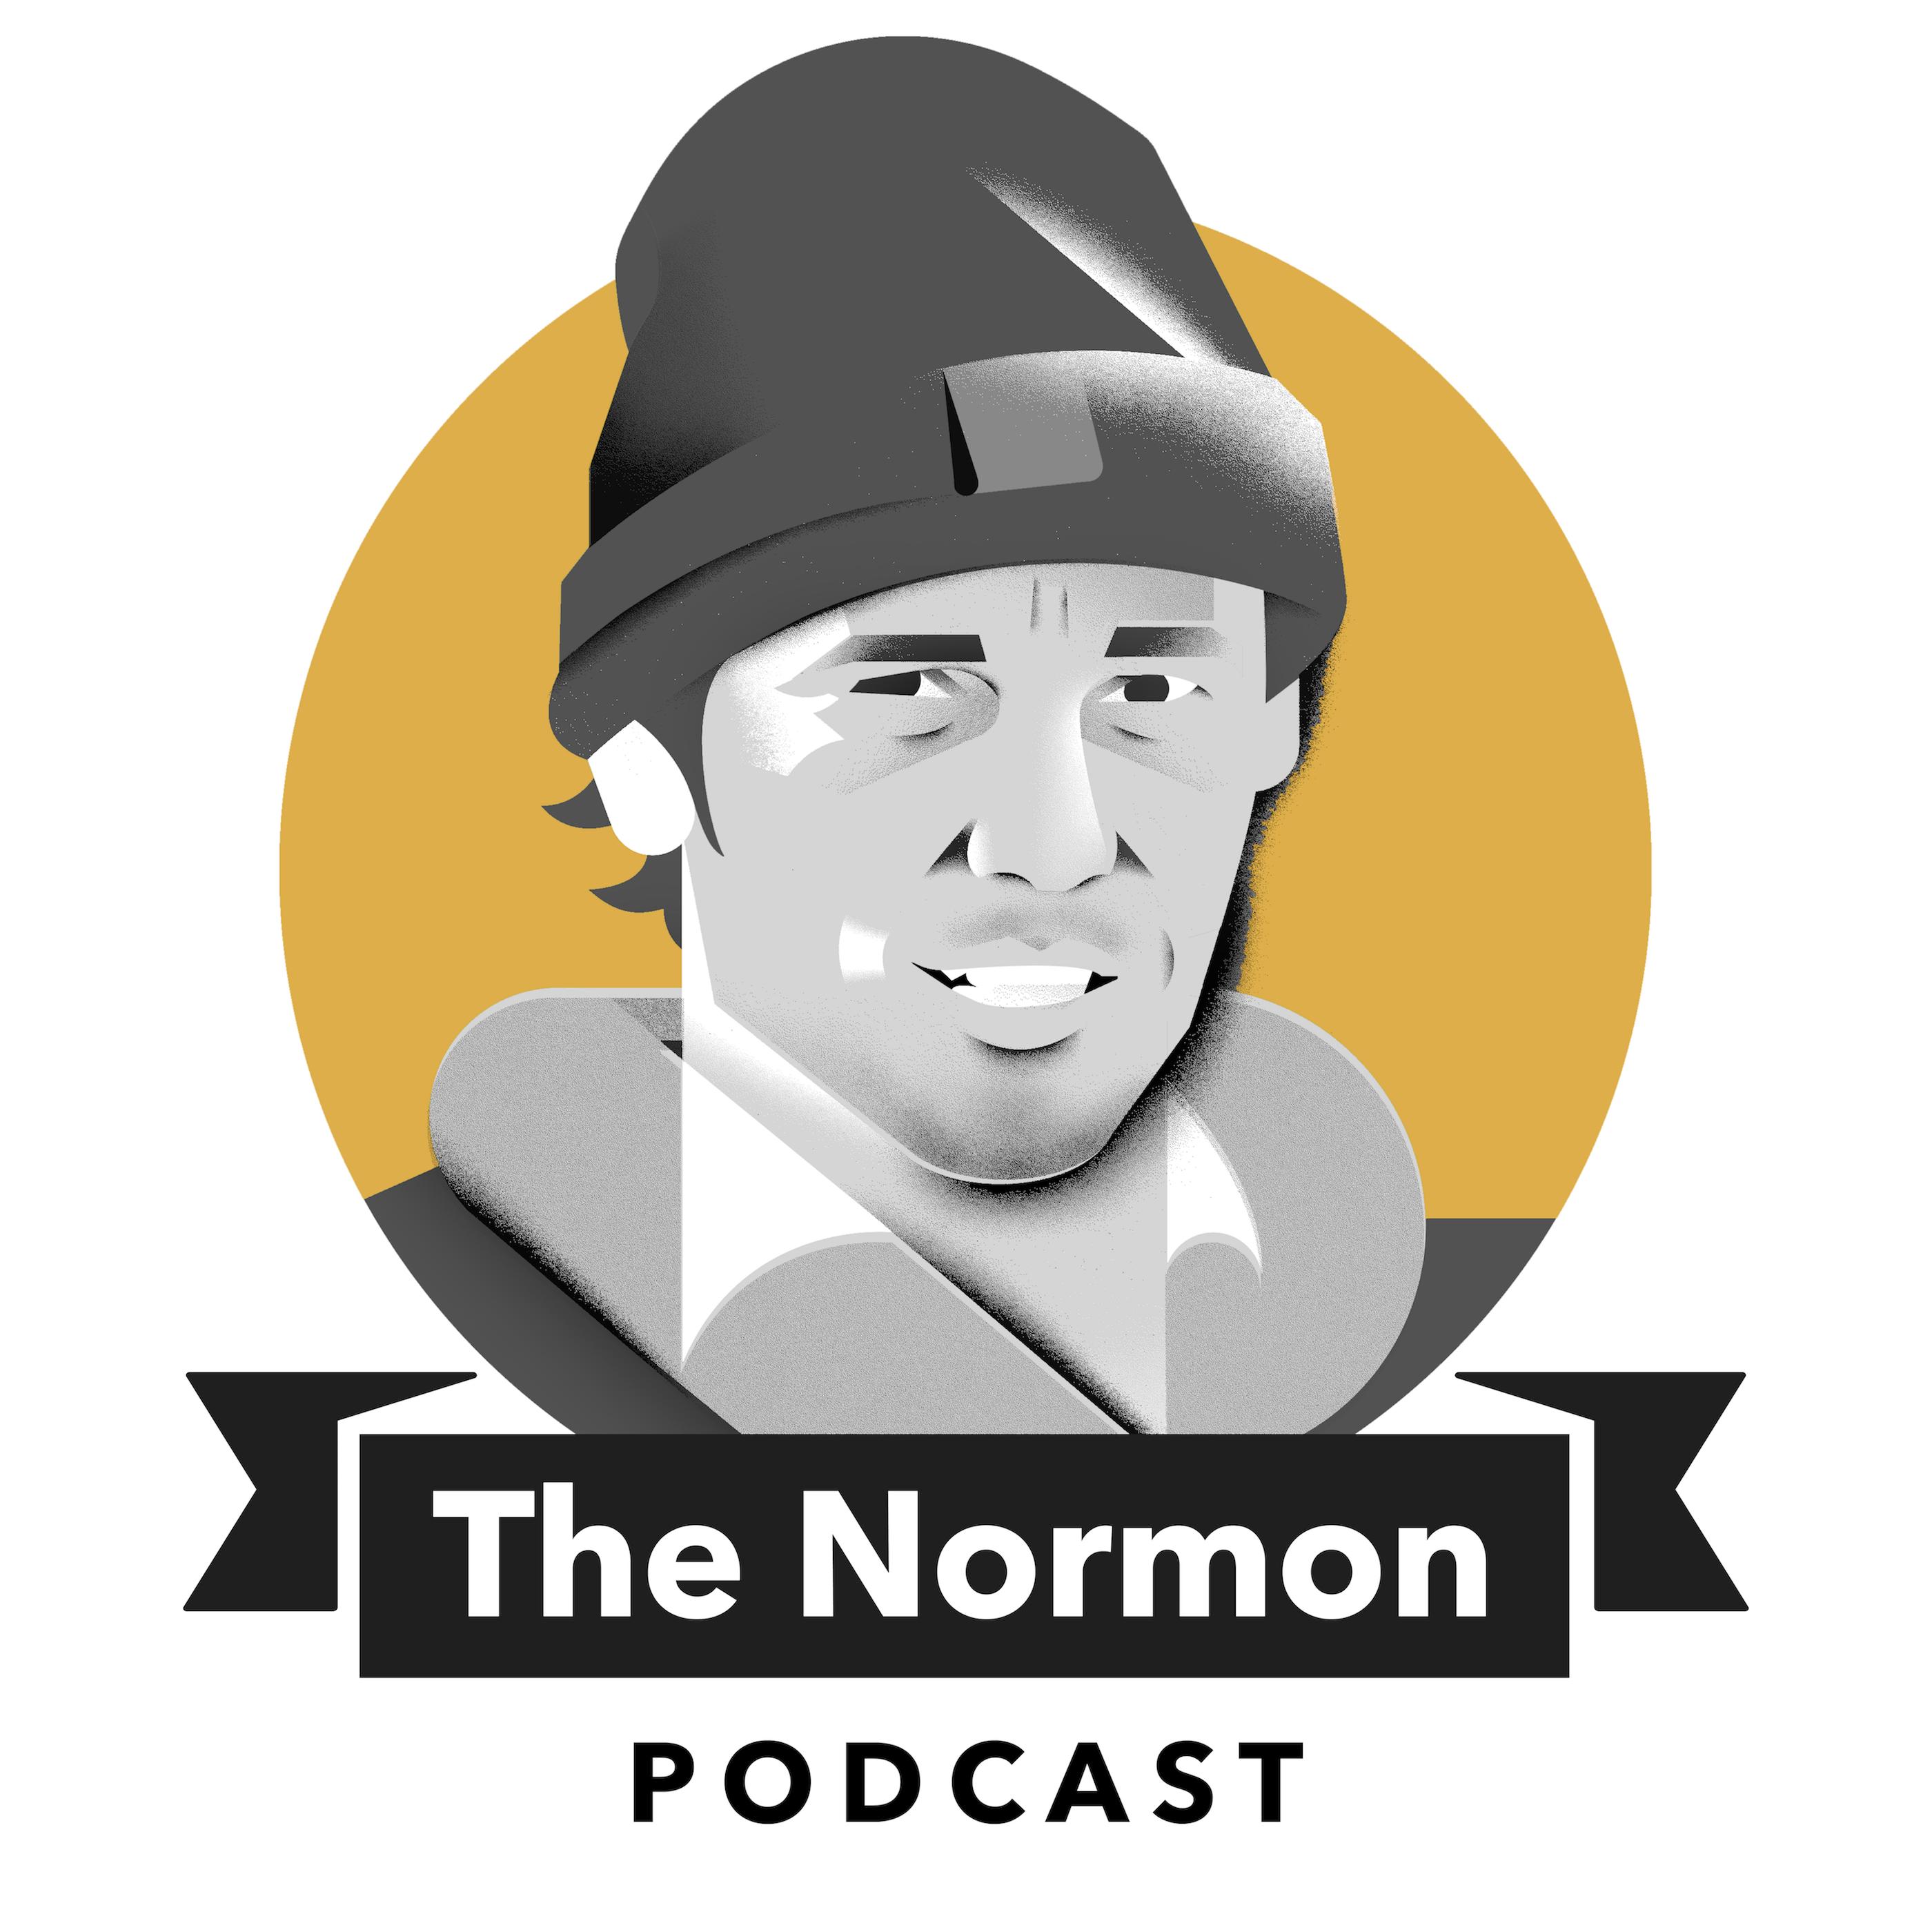 The Normon Podcast